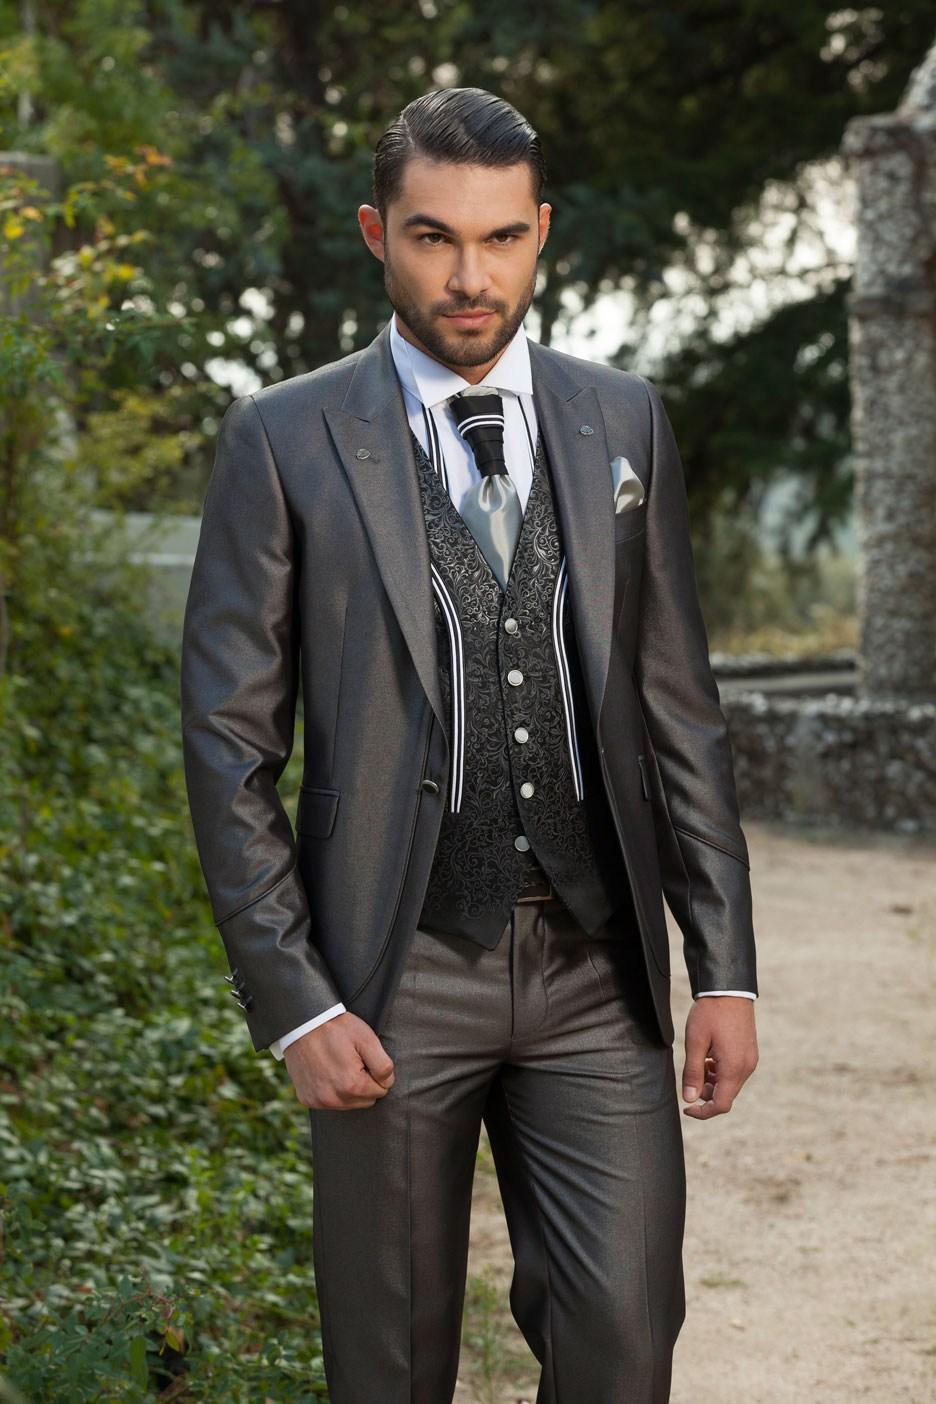 New Slim Fit Groom Tuxedos Shiny Grey Best Groomsman Wedding Suits